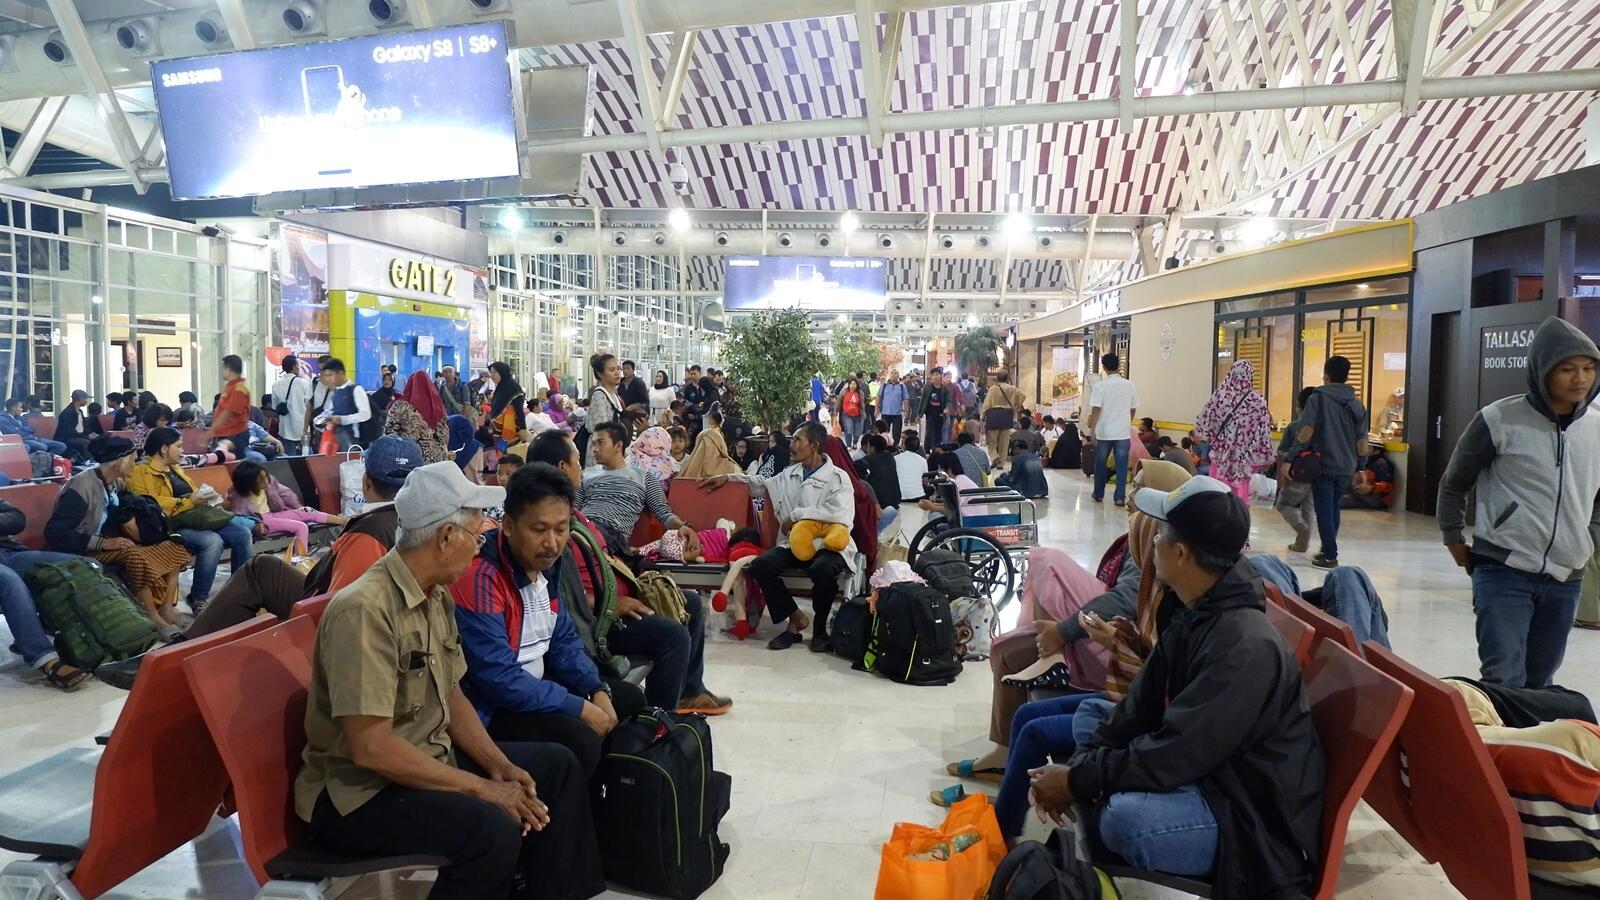 Bergurau Bawa Bom, PNS Diamankan Petugas Bandara Sultan Hasanuddin